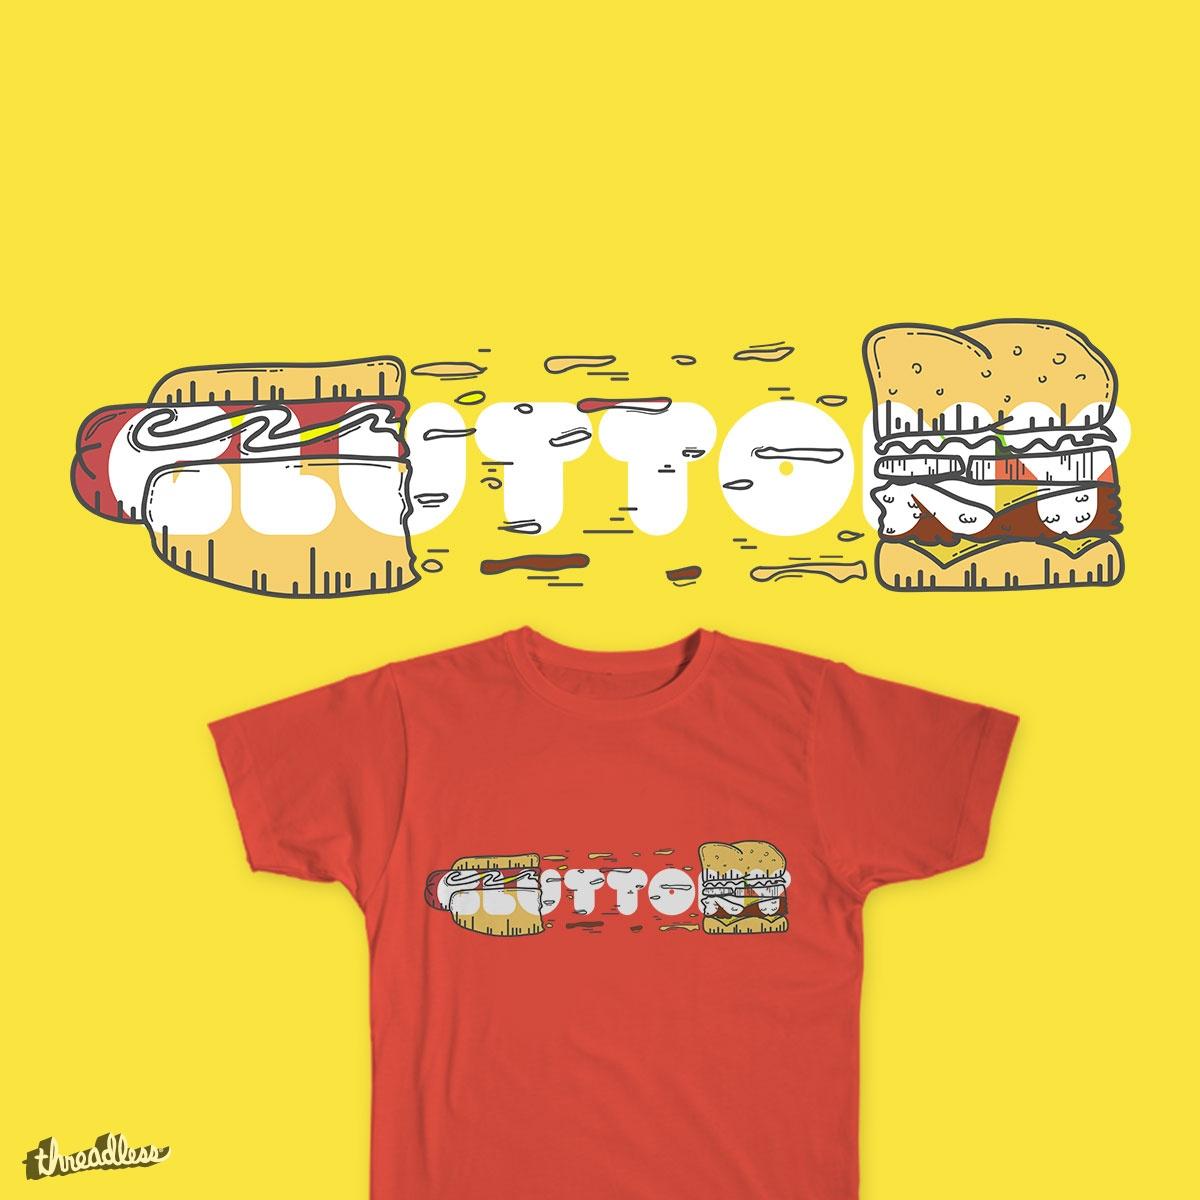 Gluttony by yotii on Threadless